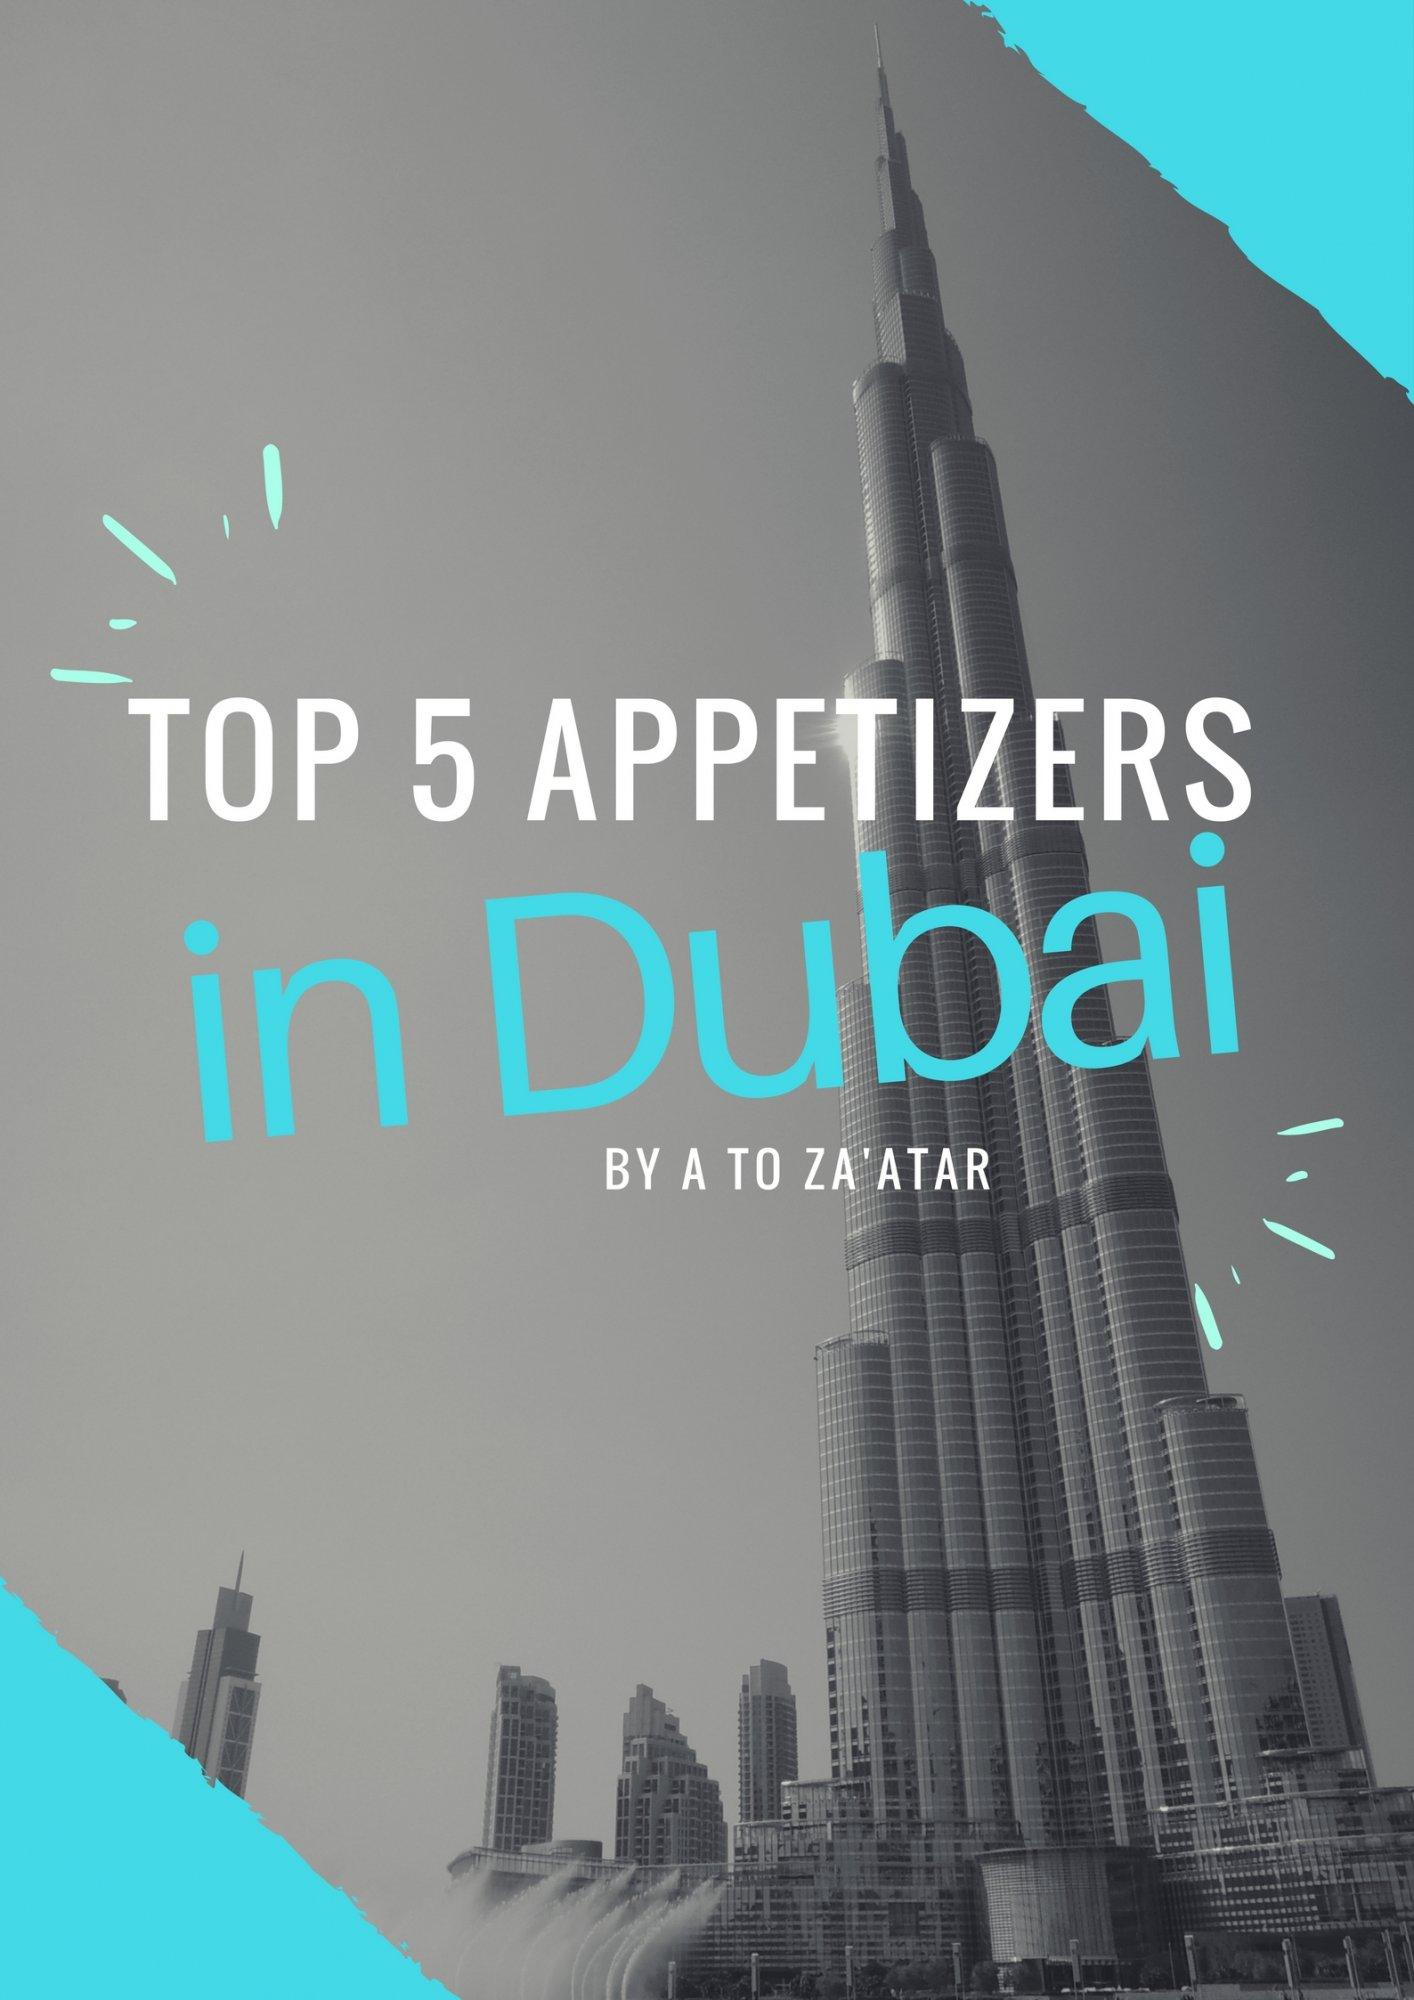 Top Five Appetizers in Dubai.